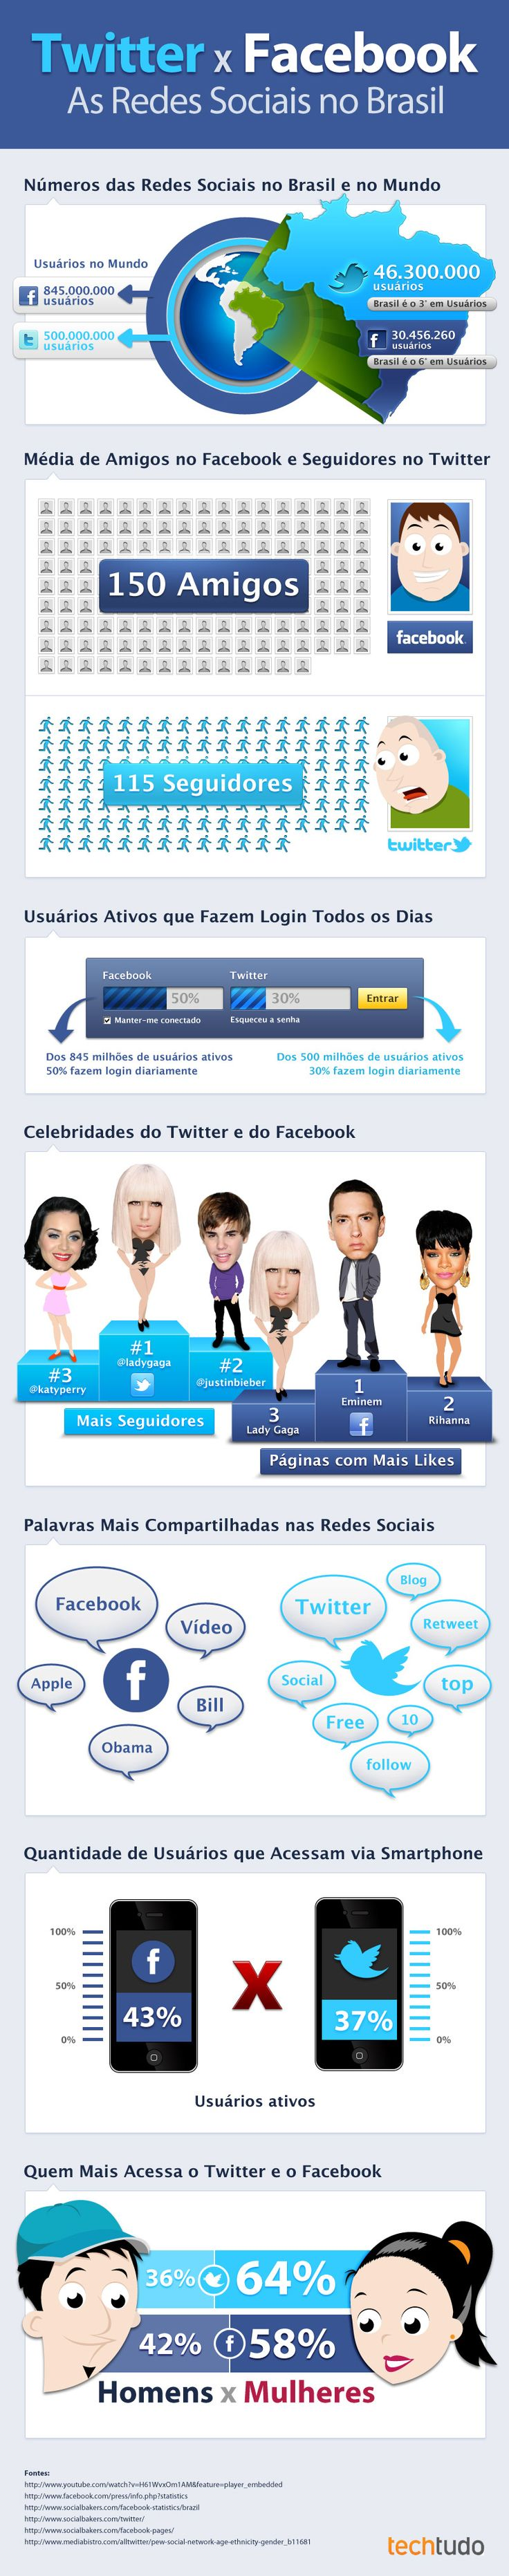 Infográfico Twitter vs Facebook LAS REDES SOCIALES